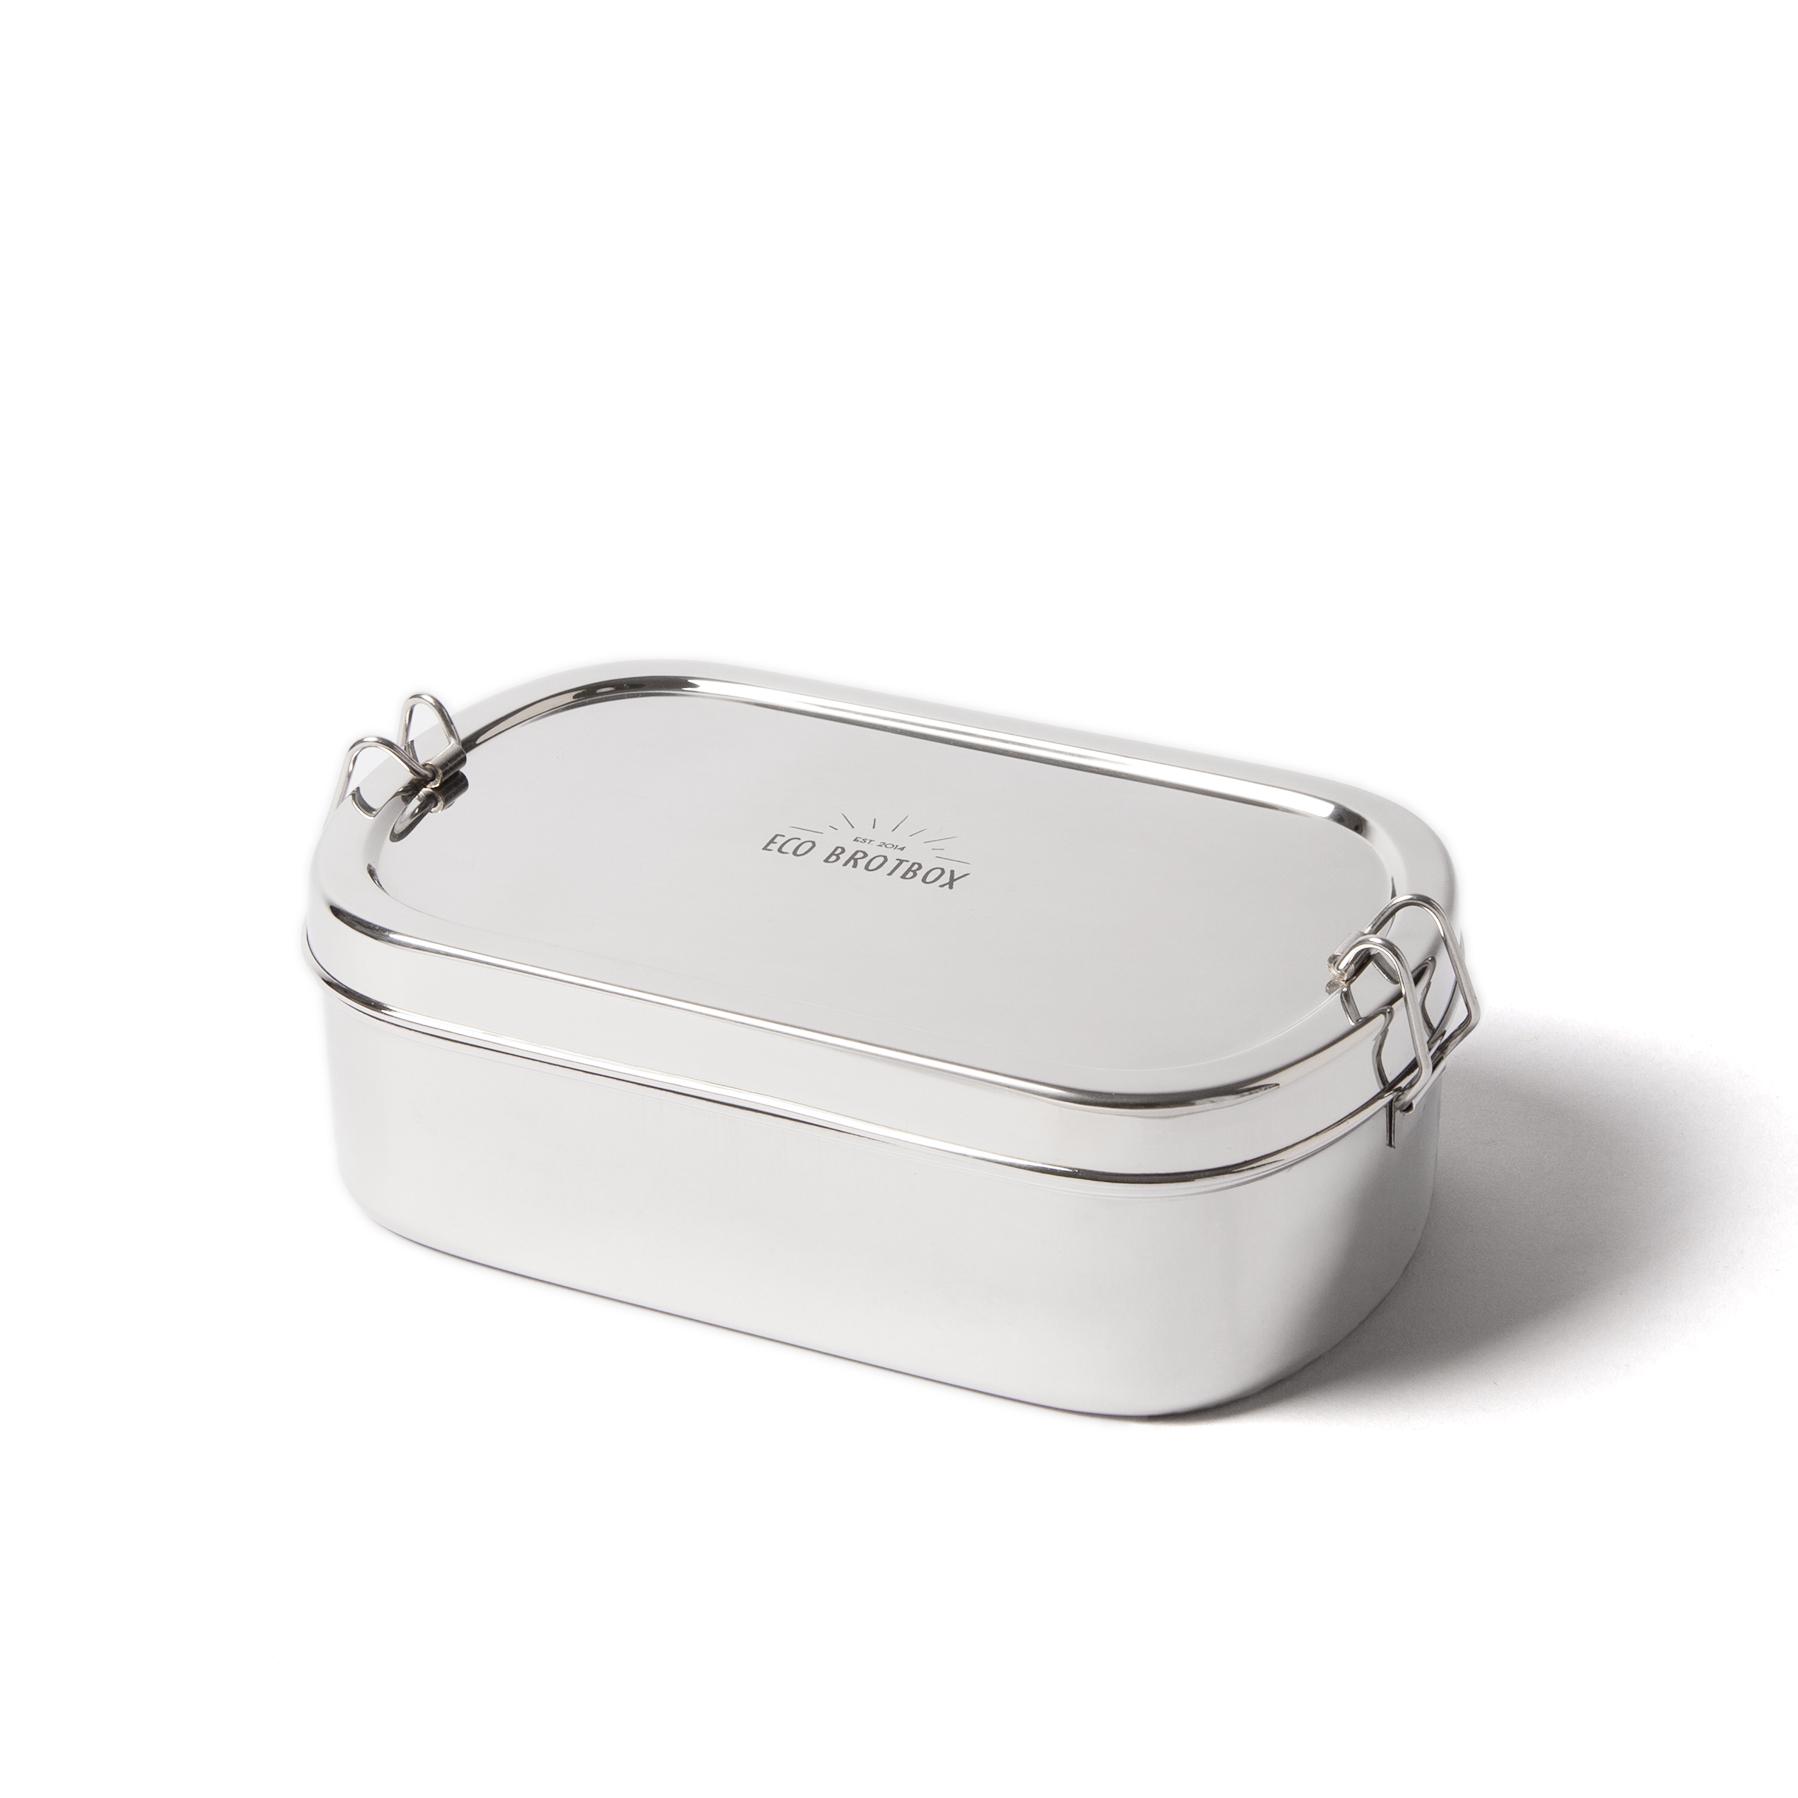 Goodies Box aus Edelstahl, EcoBrotbox